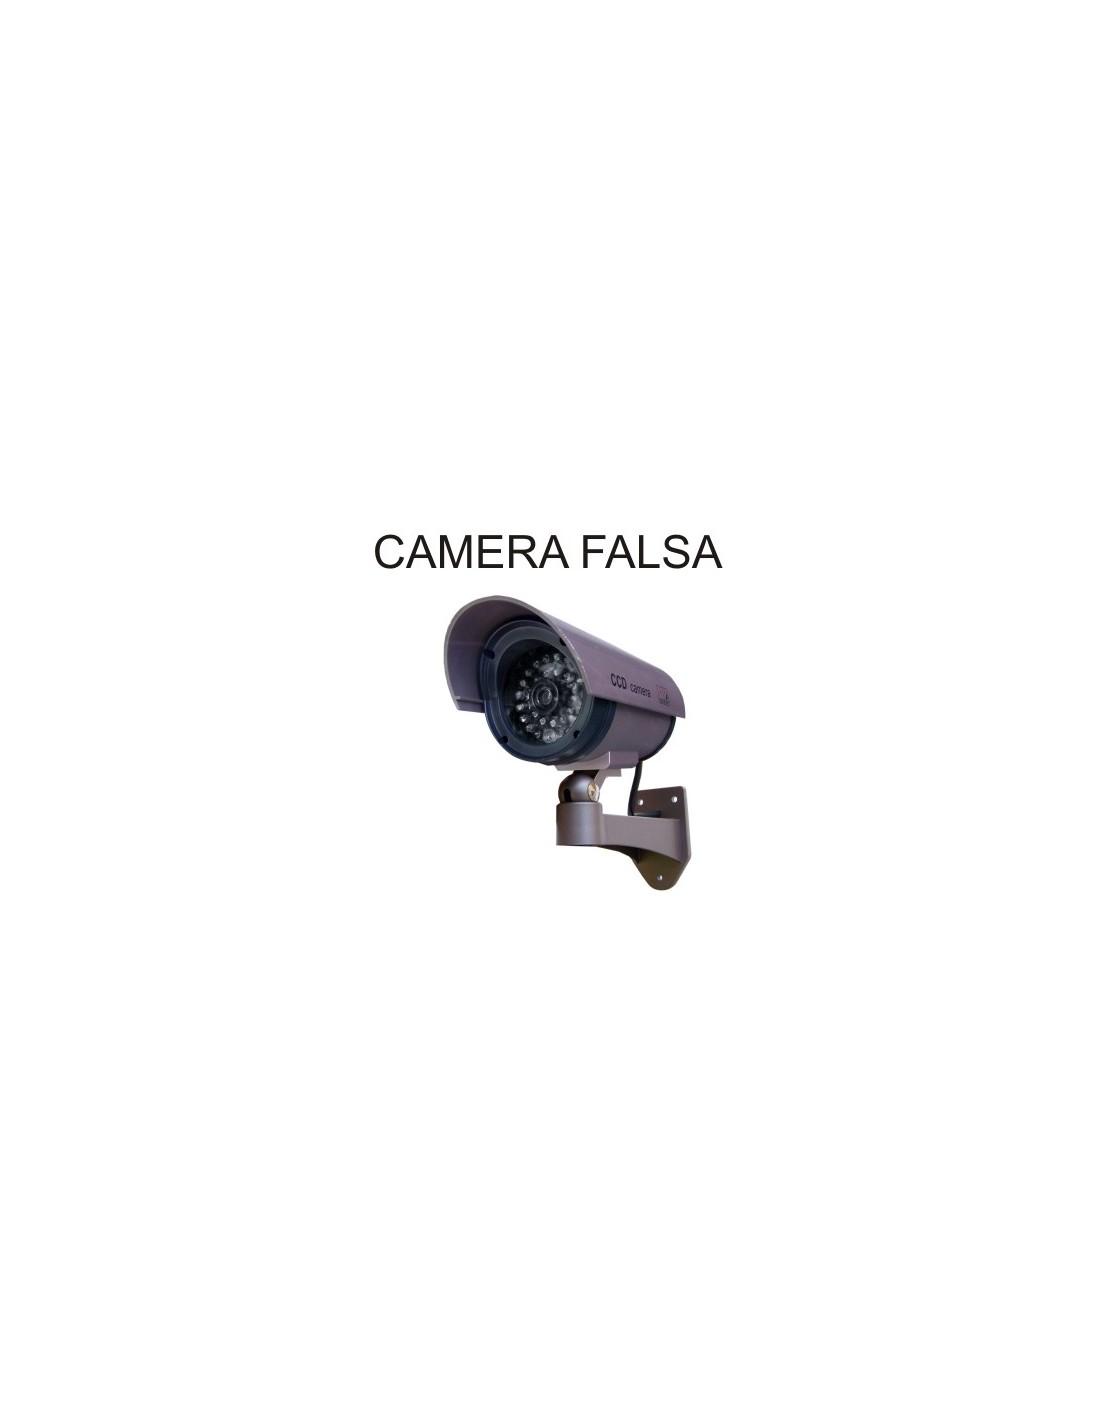 Camera vigilancia falsa com leds realista plural lojas - Camera de vigilancia ...